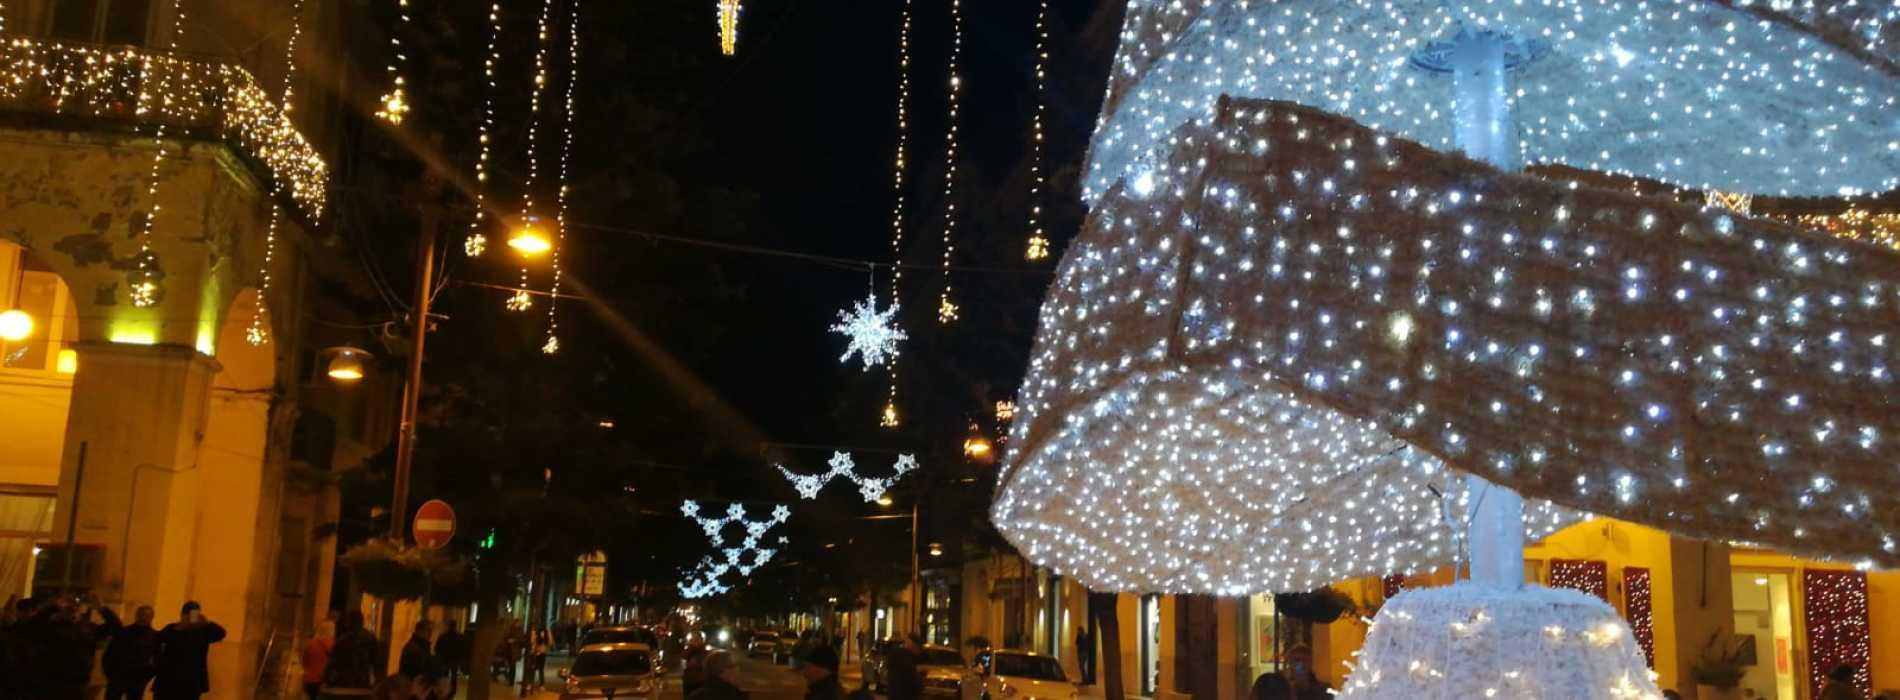 Notte Bianca a Caserta, stop al traffico per tutto il week-end